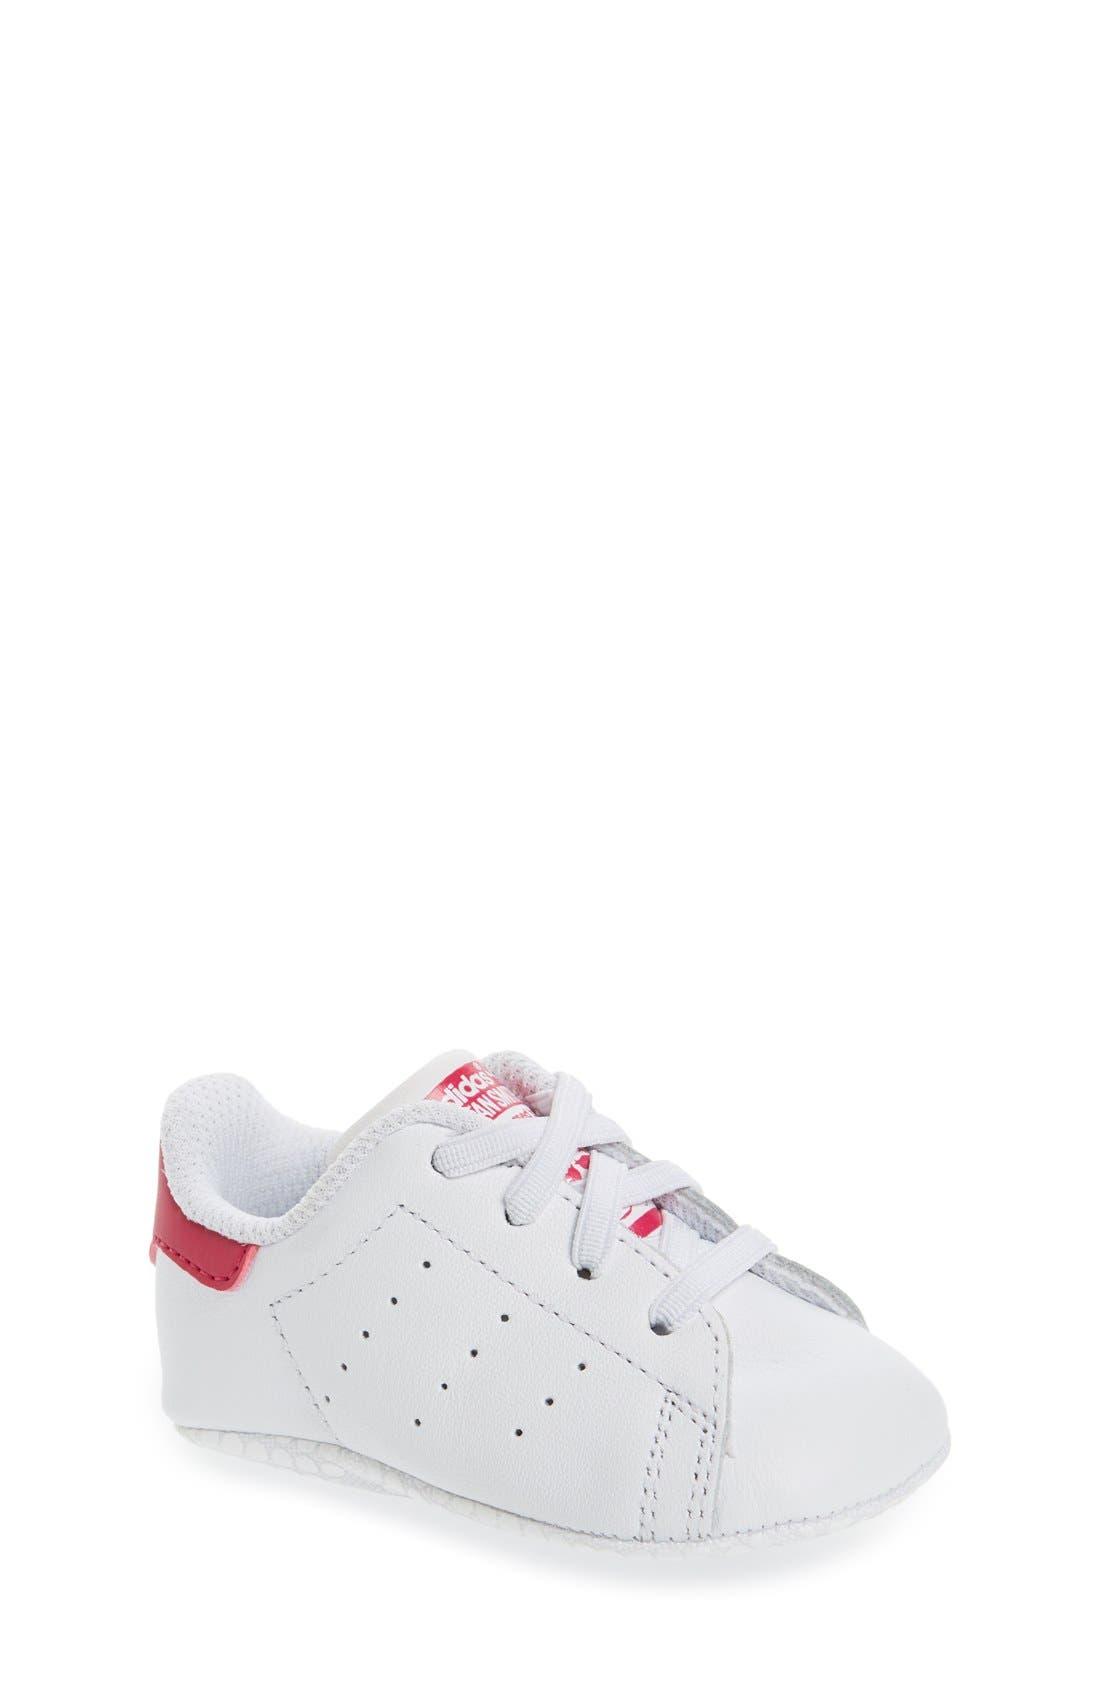 'Stan Smith' Crib Sneaker,                         Main,                         color, White/ White/ Pink